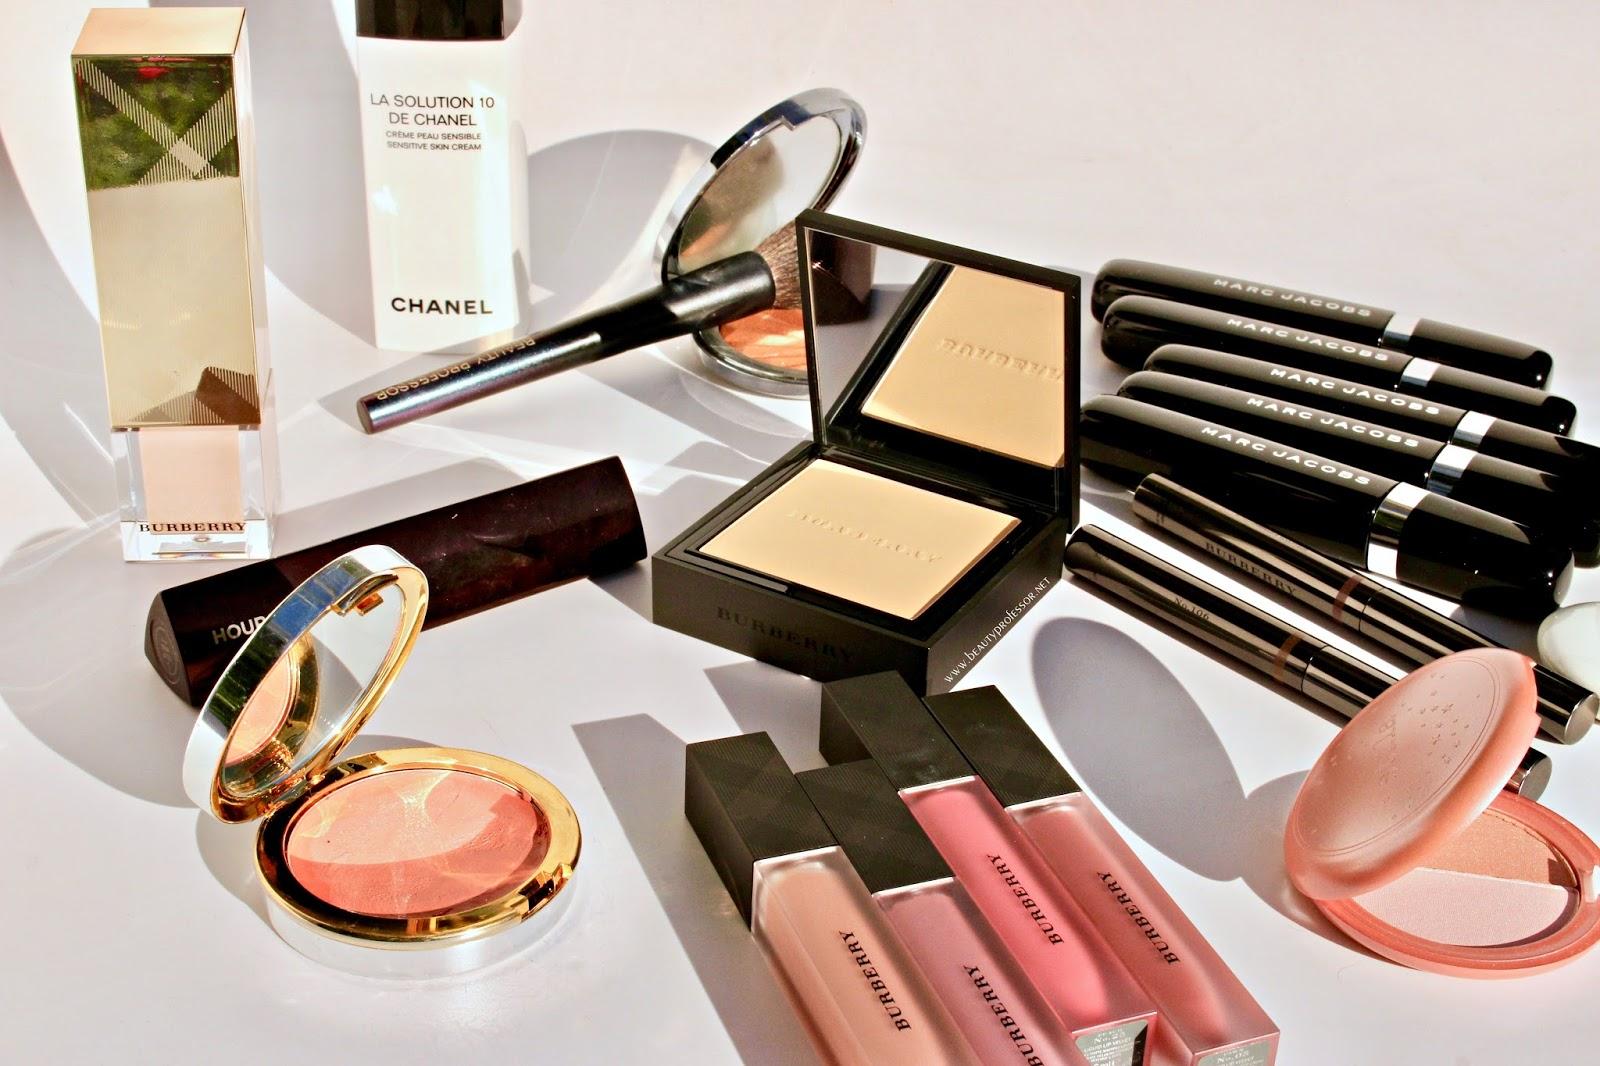 44f5adb23d45 January FOTD: Burberry Liquid Lip Velvets + Marc Jacobs Omega Lash + Five  Years of Beauty Professor